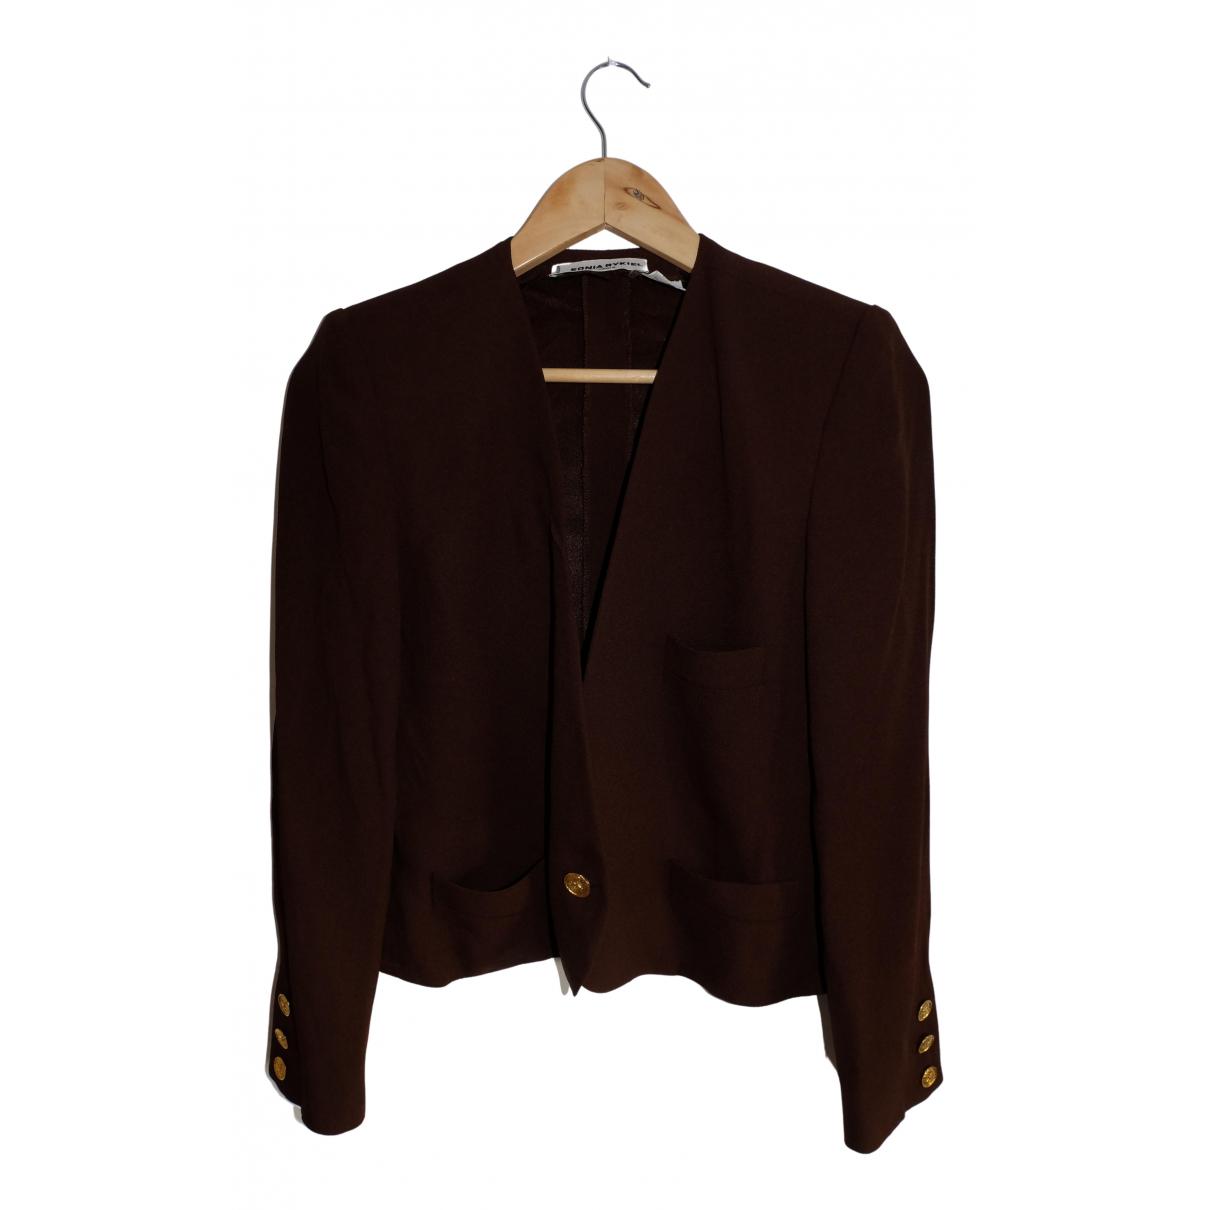 Sonia Rykiel N Brown jacket for Women 40 FR